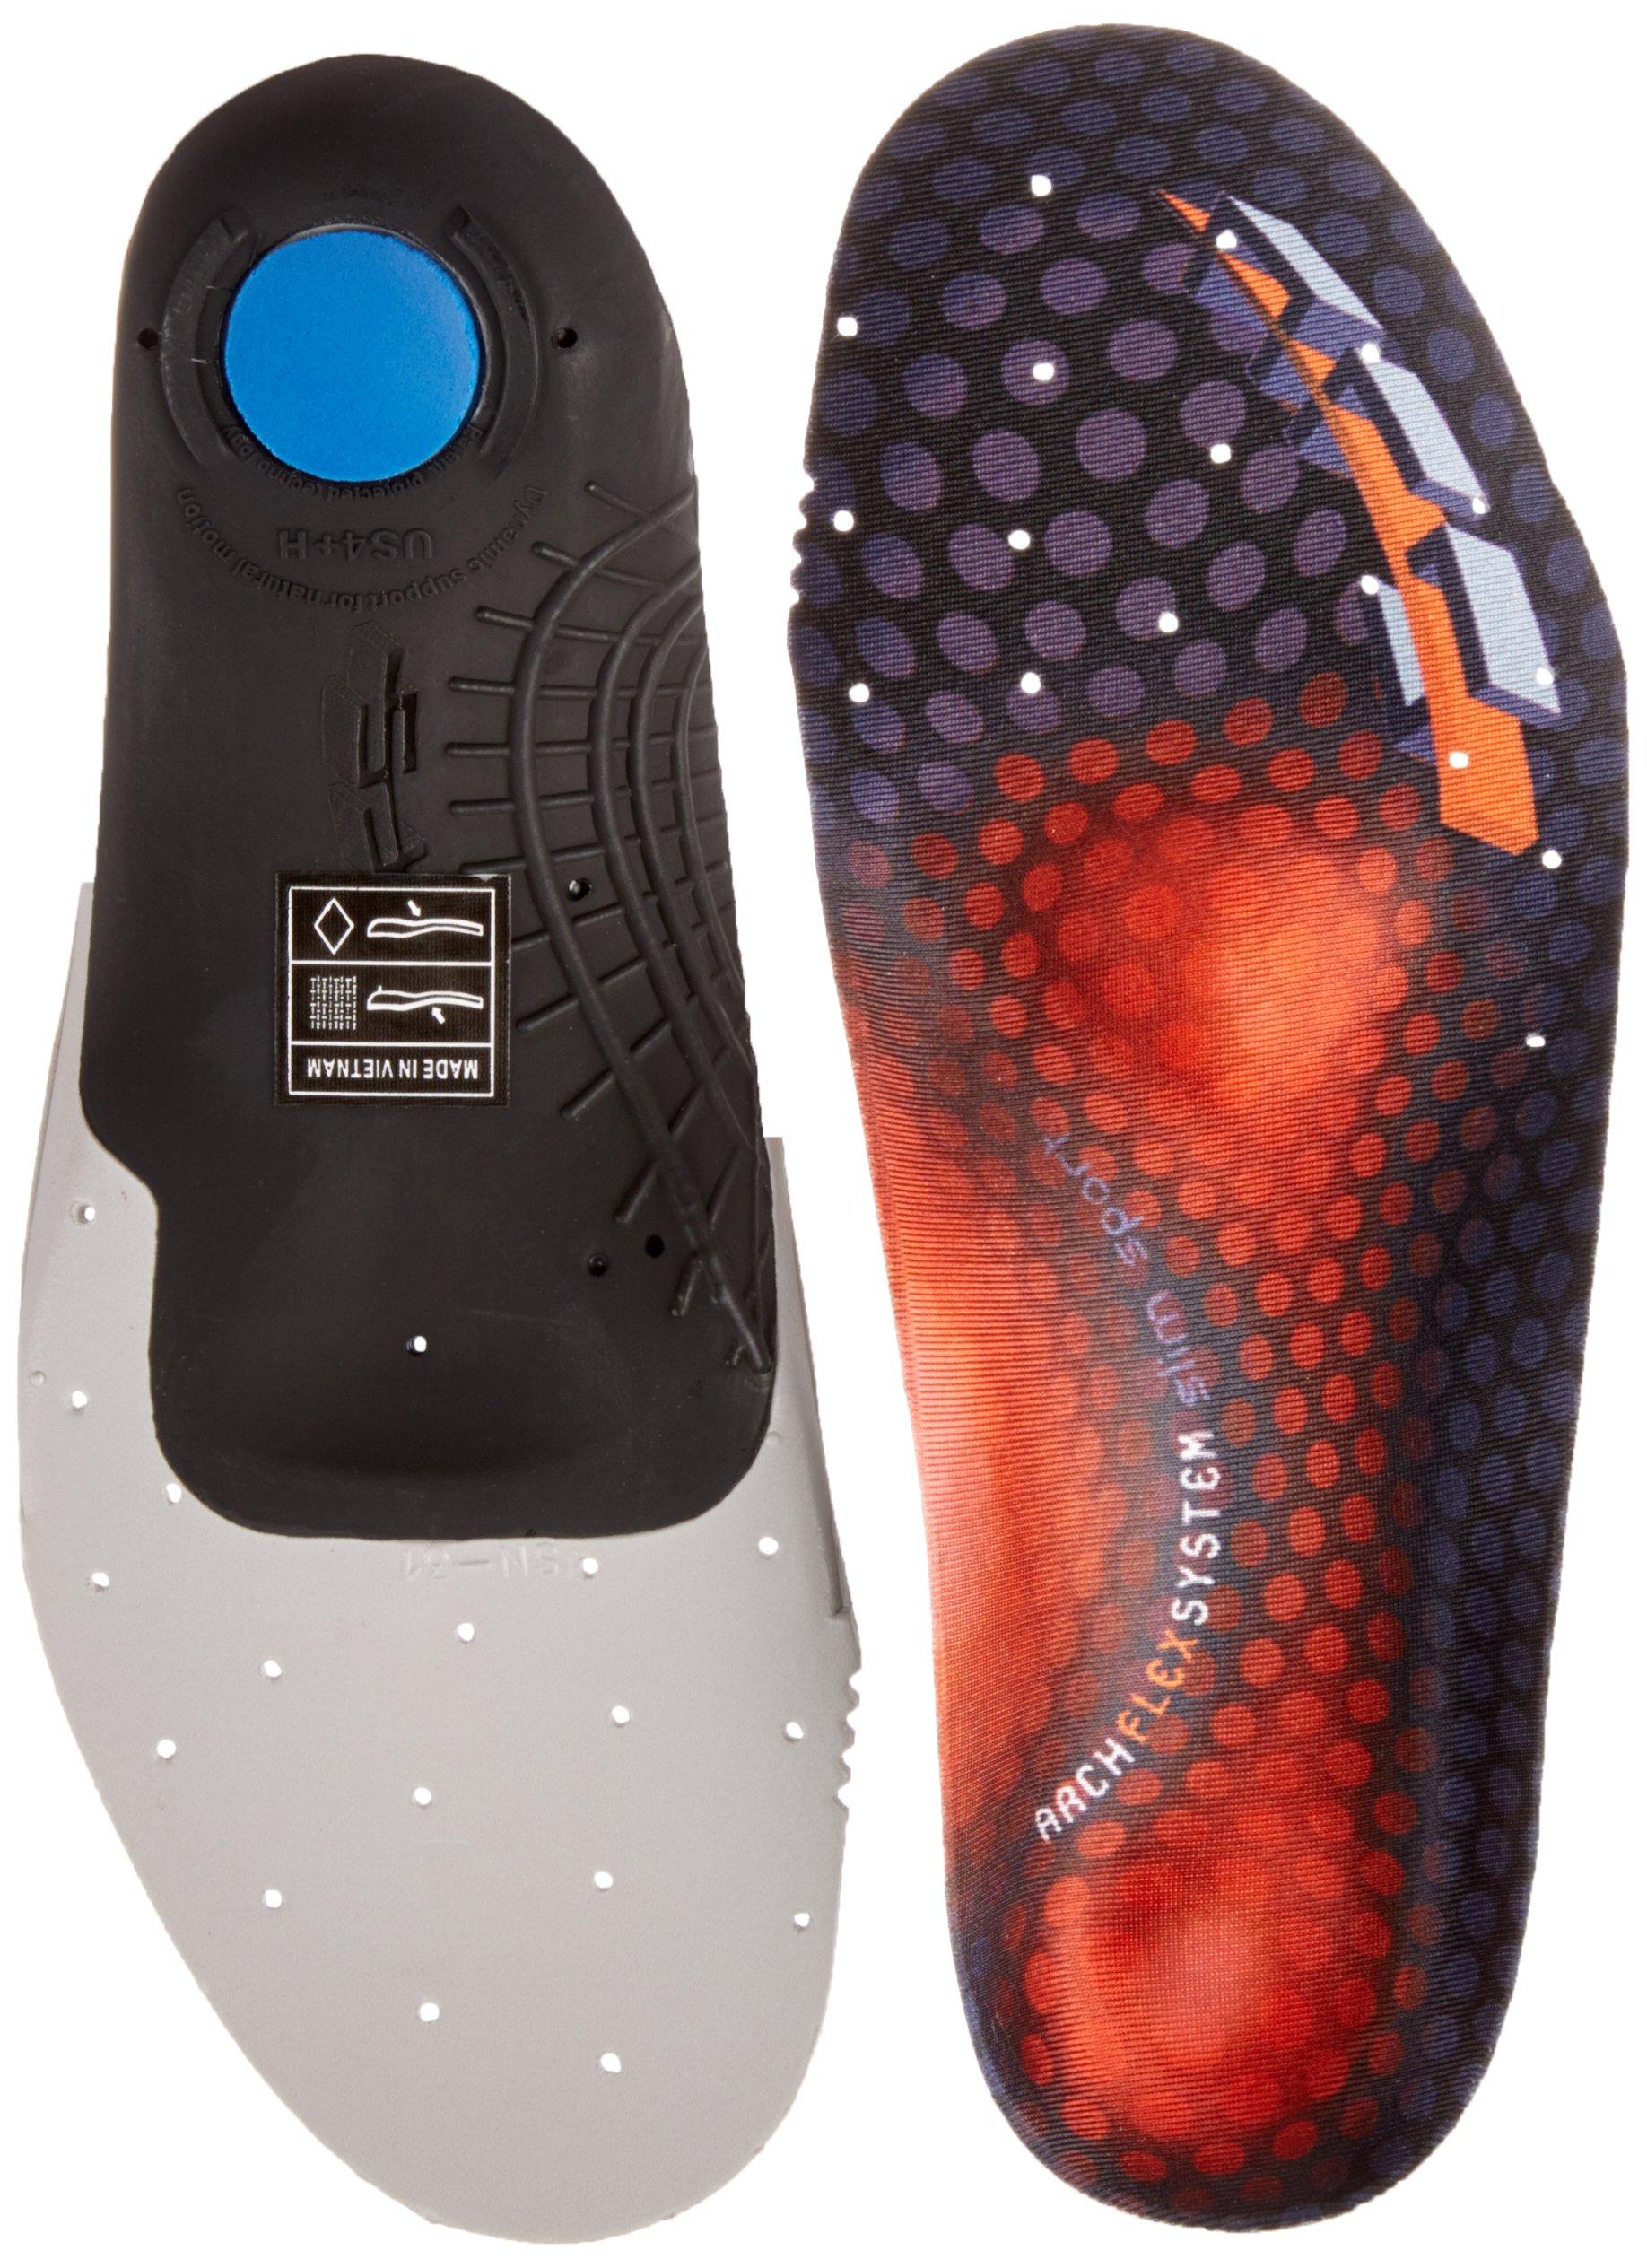 ArchFlexSystem SlimSport High Arch Footbeds, Red, Men' s 9+/Women' s 10.5+ by ArchFlexSystem Footbeds